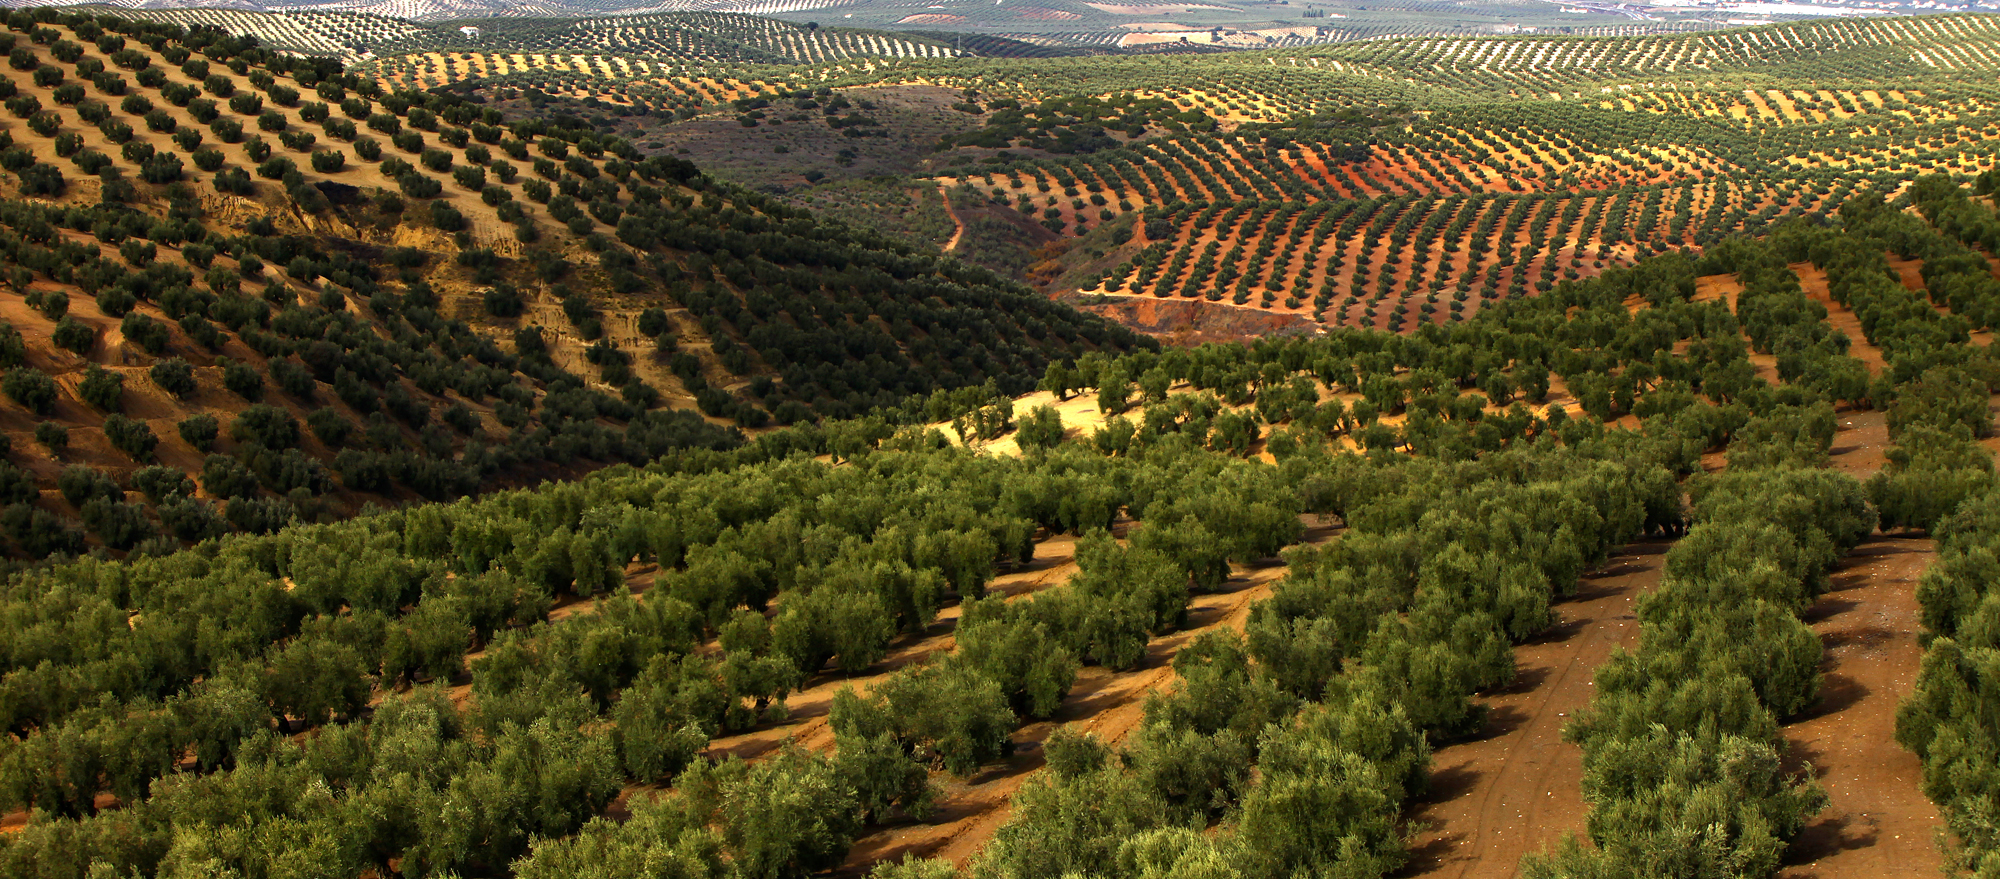 davor rostuhar, spain, jug spanjolske, andaluzija, andalusia, spain nature